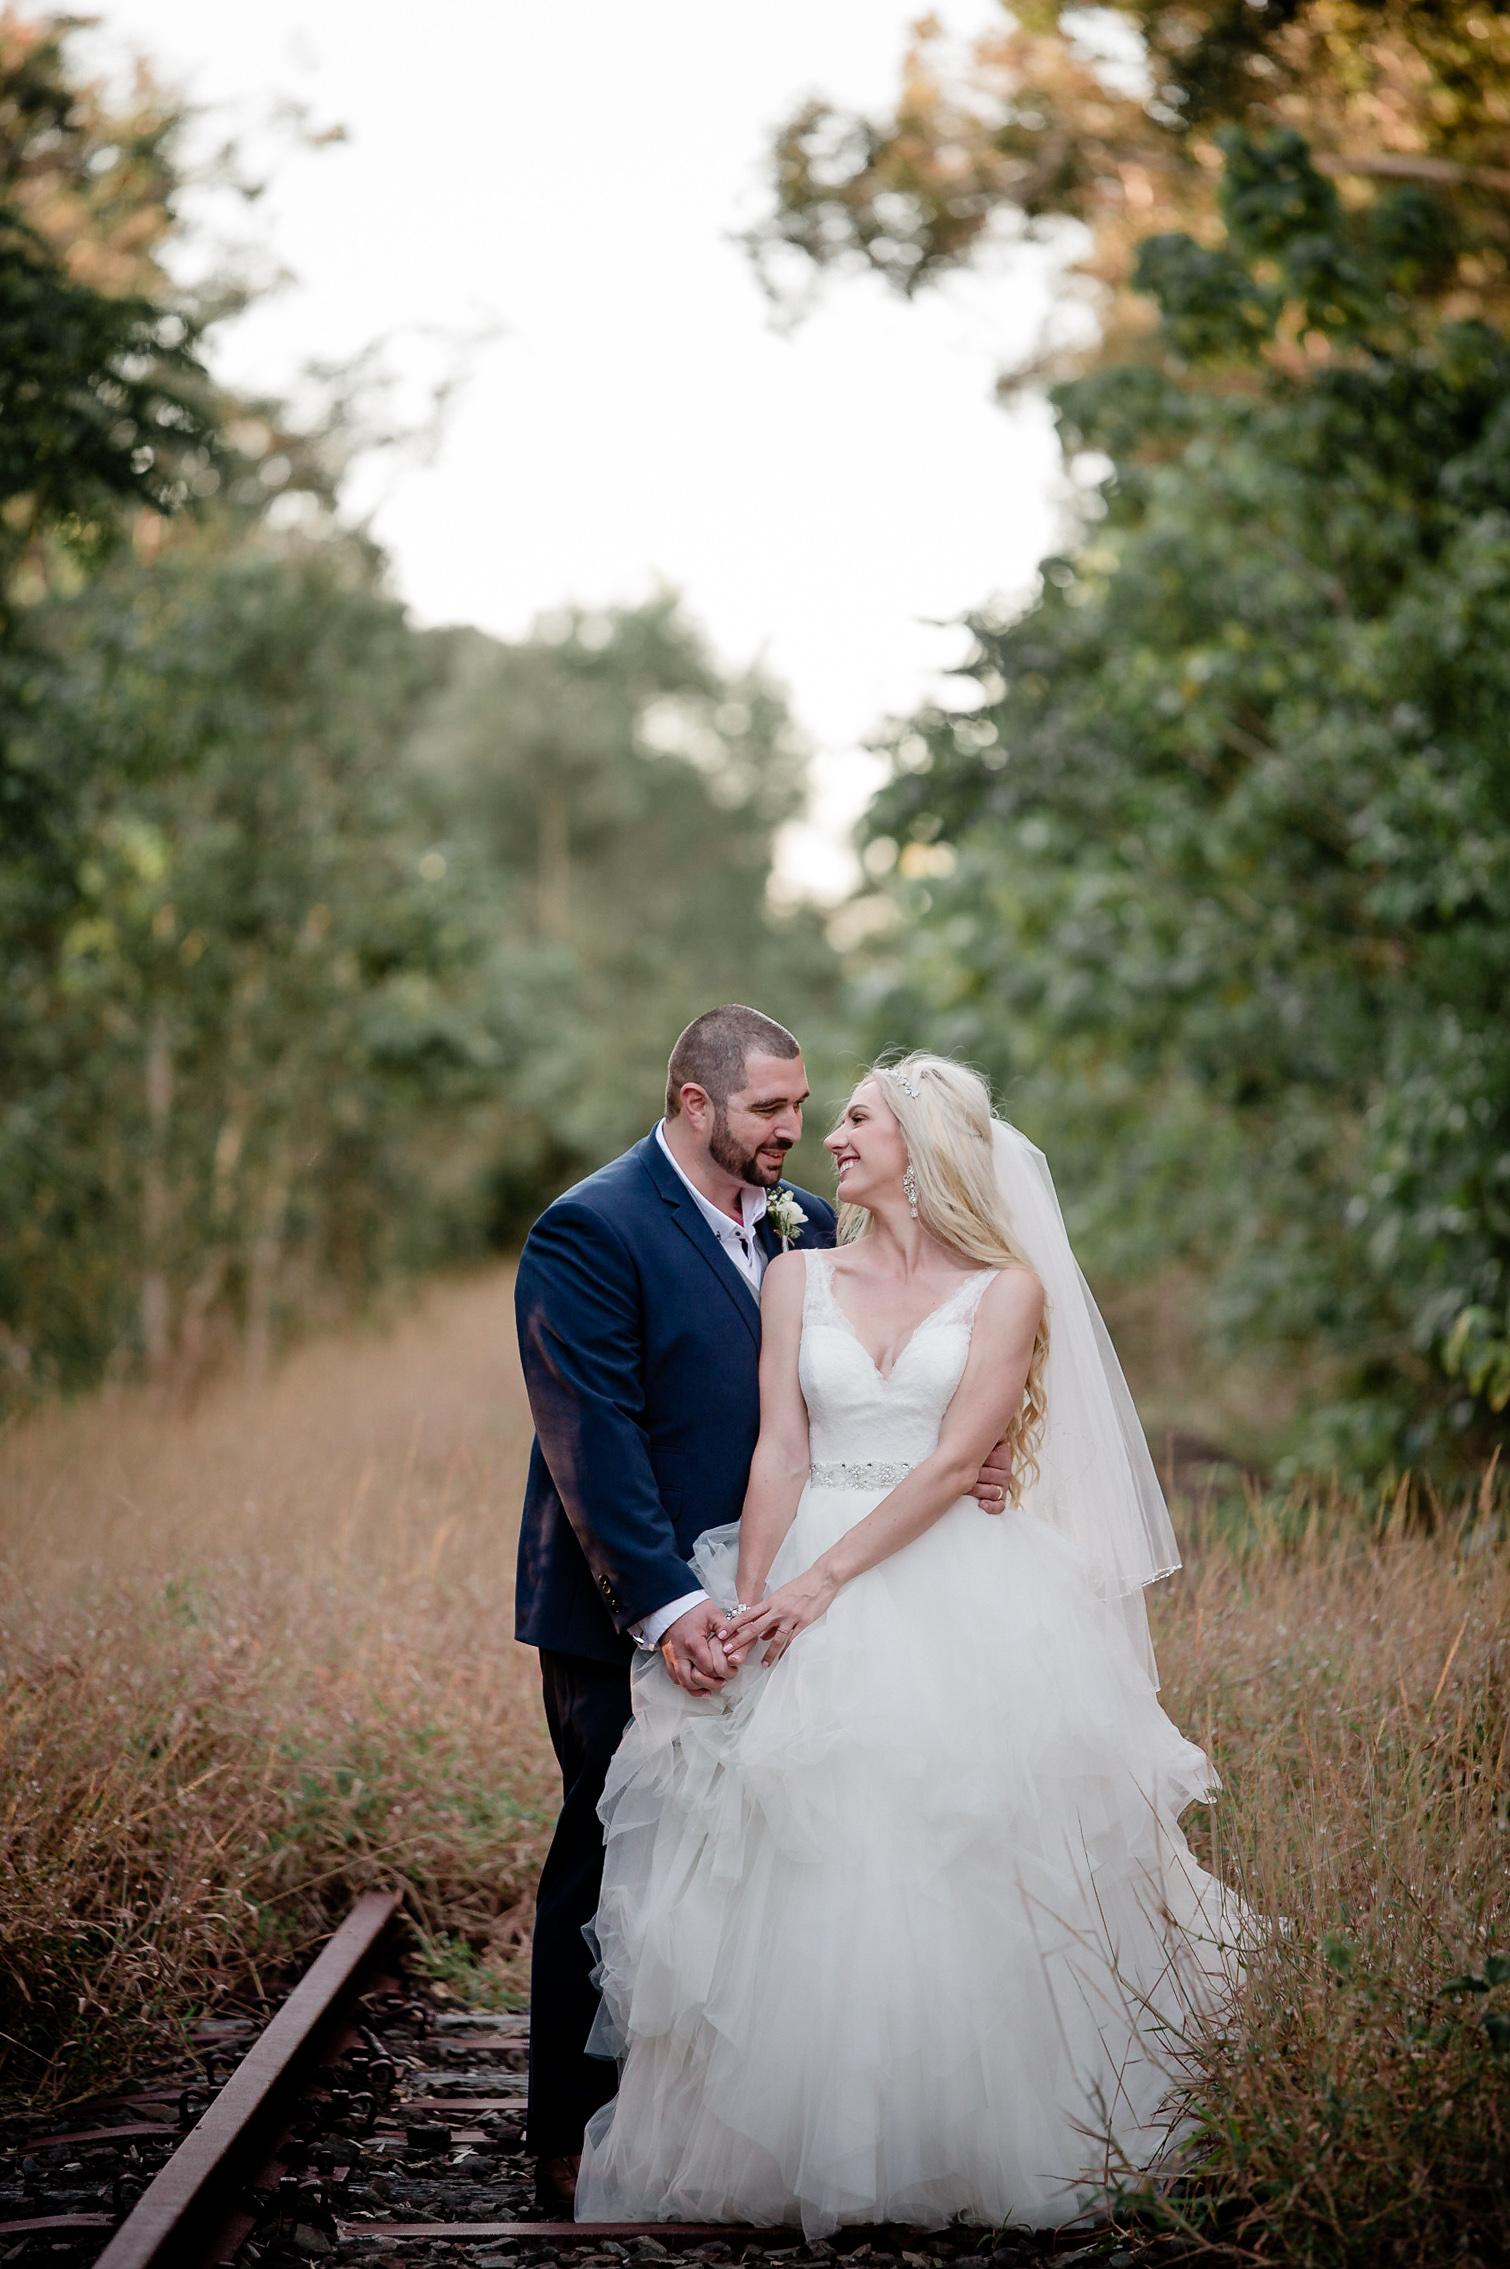 The_Belongil_Byron_Bay_Weddings_New_Black_Studios-120.jpg